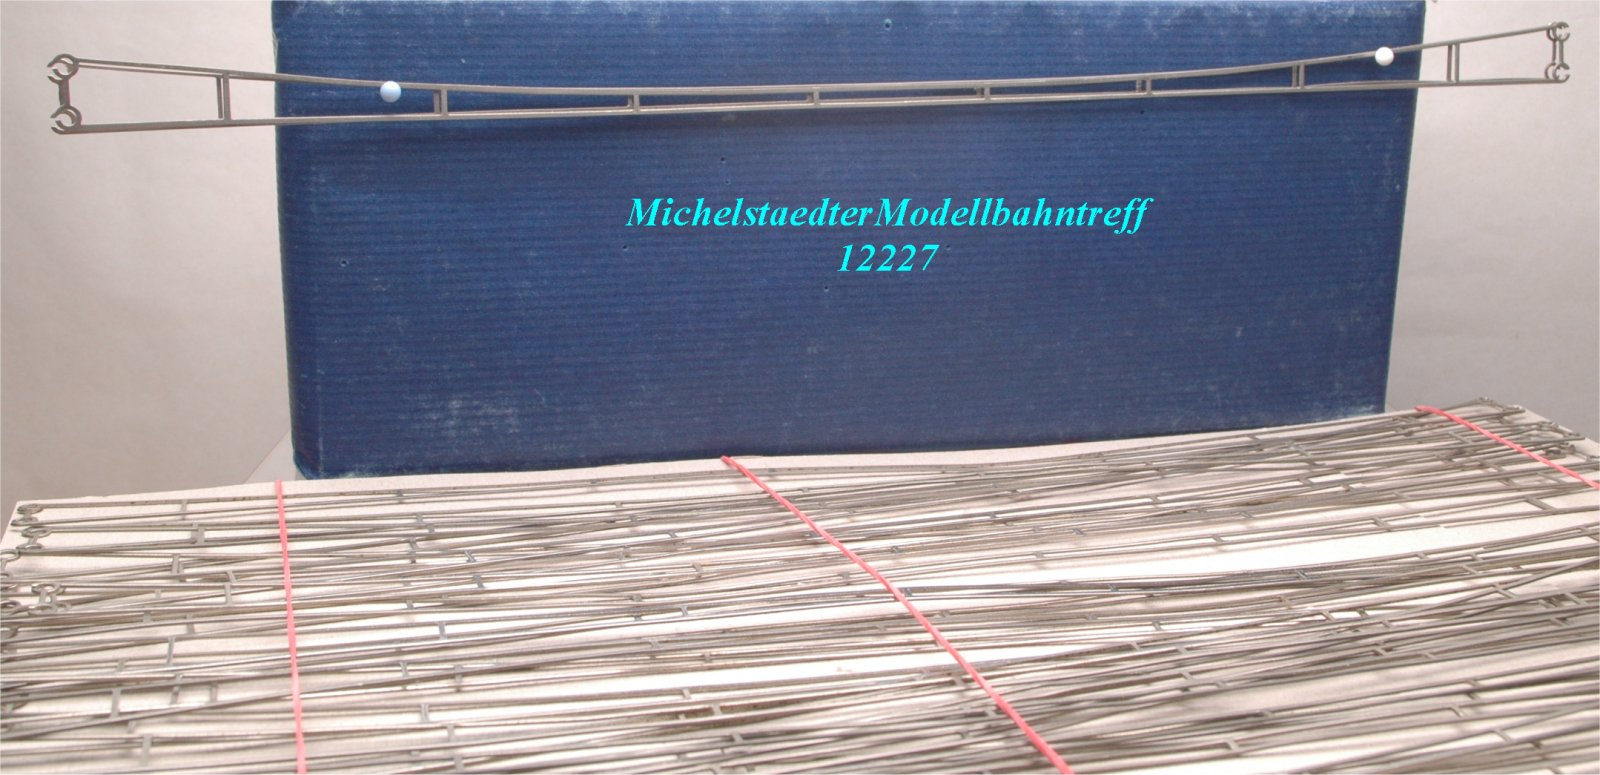 Märklin 7019 Oberleitungs-Fahrdraht, (12227)